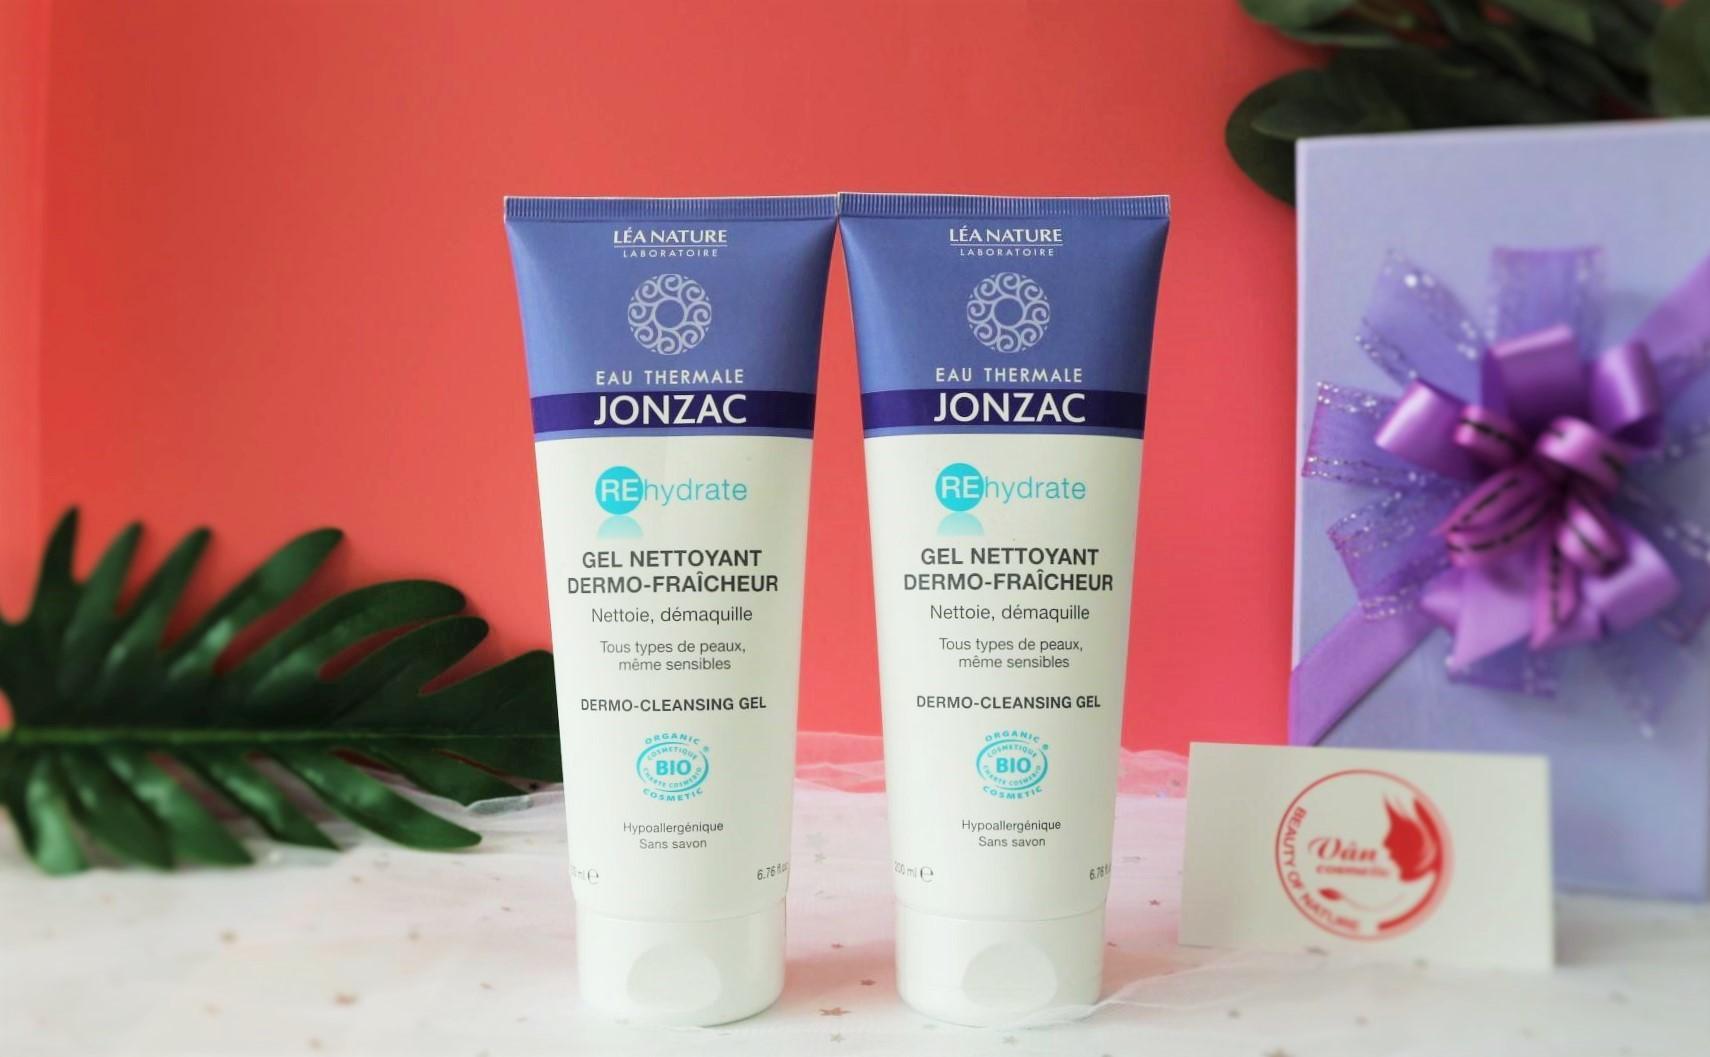 Gel Rửa Mặt Cấp Nước Eau Thermale Jonzac Rehydrate Dermo – Cleansing Gel